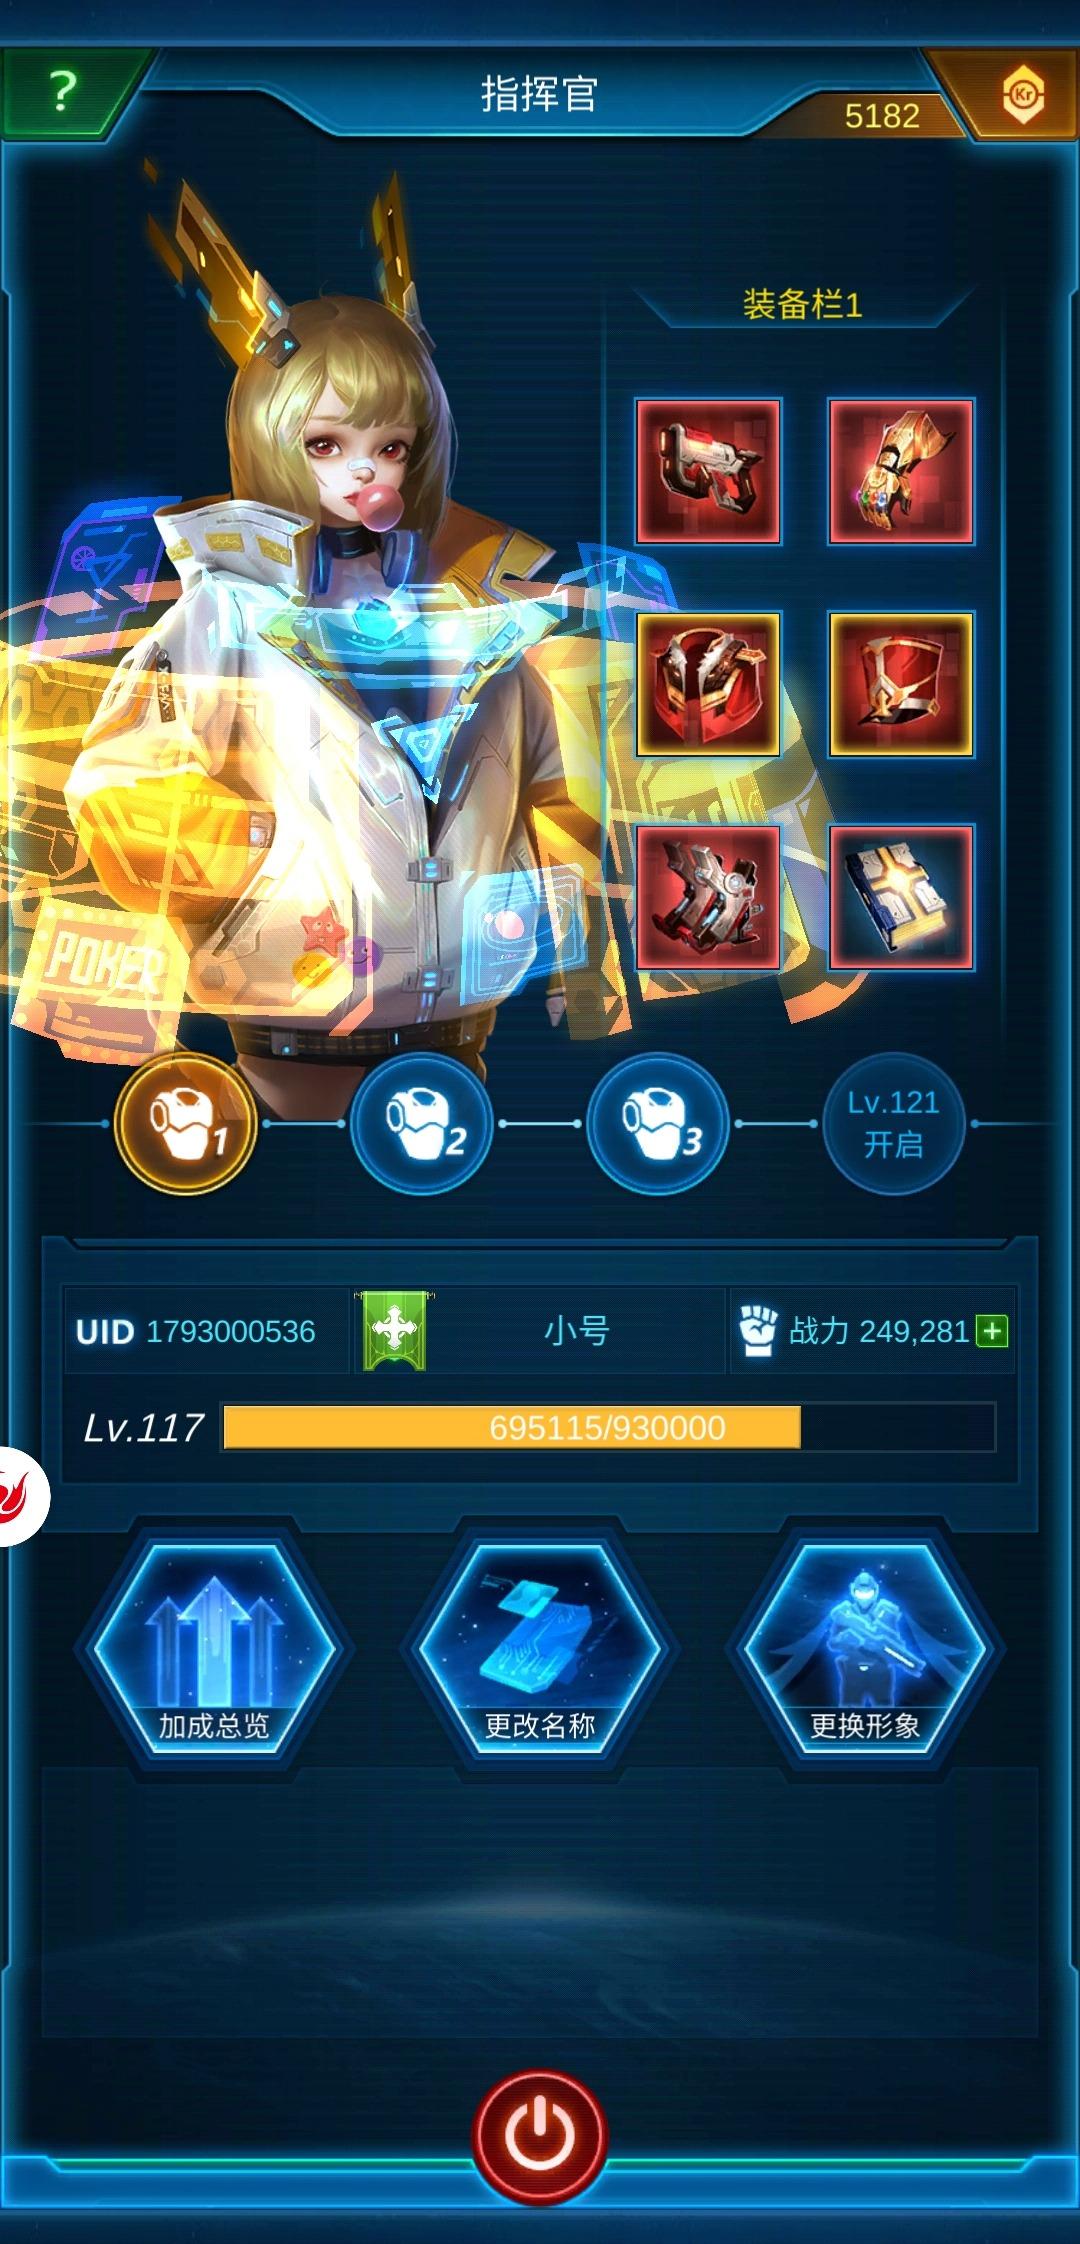 Screenshot_2021-05-07-13-53-44-177_com.jedigames.p16s.luobo.jpg